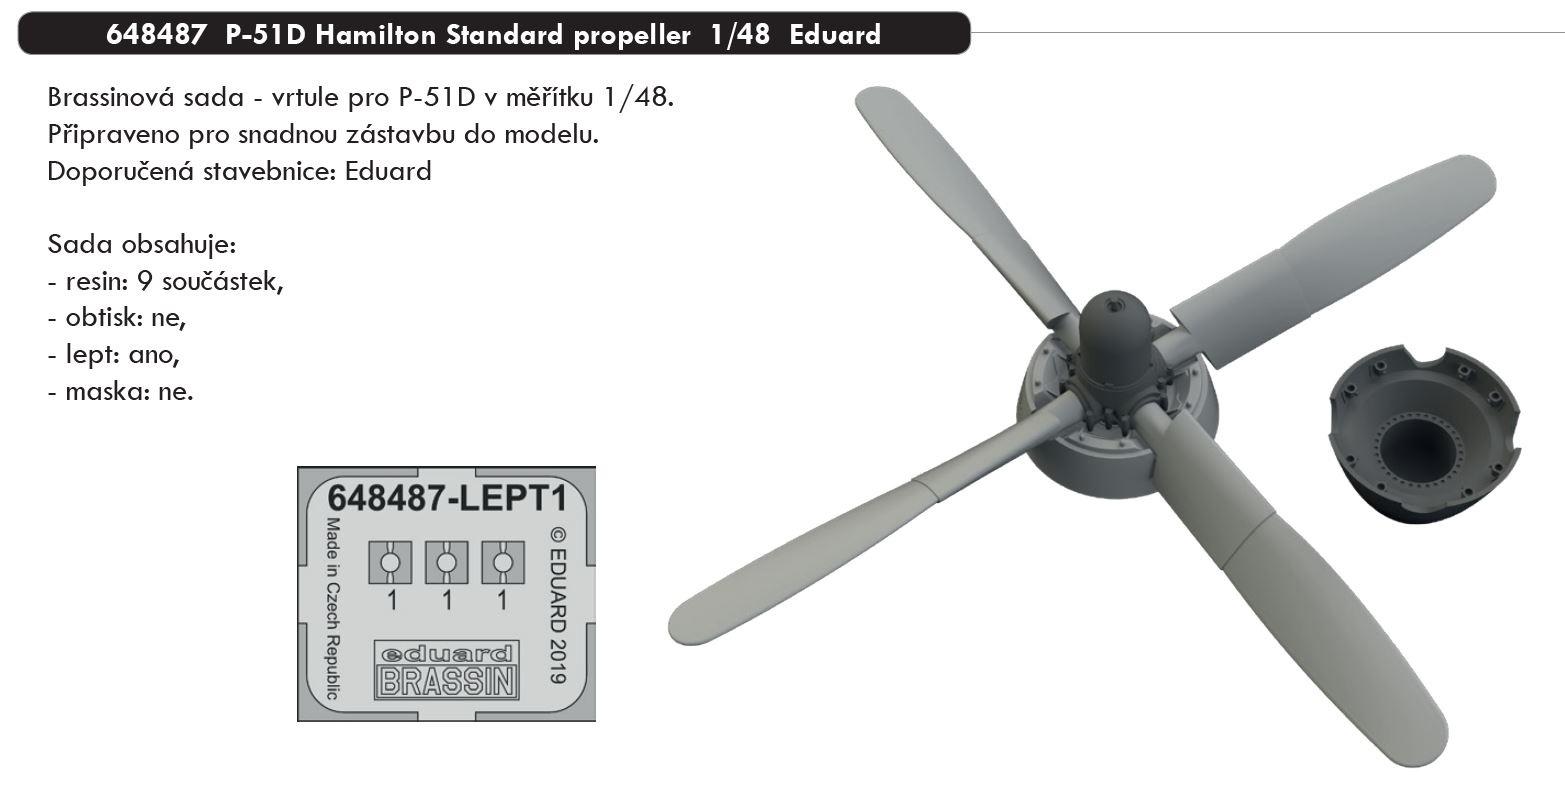 1/48 P-51D Hamilton Standard propeller (EDUARD)